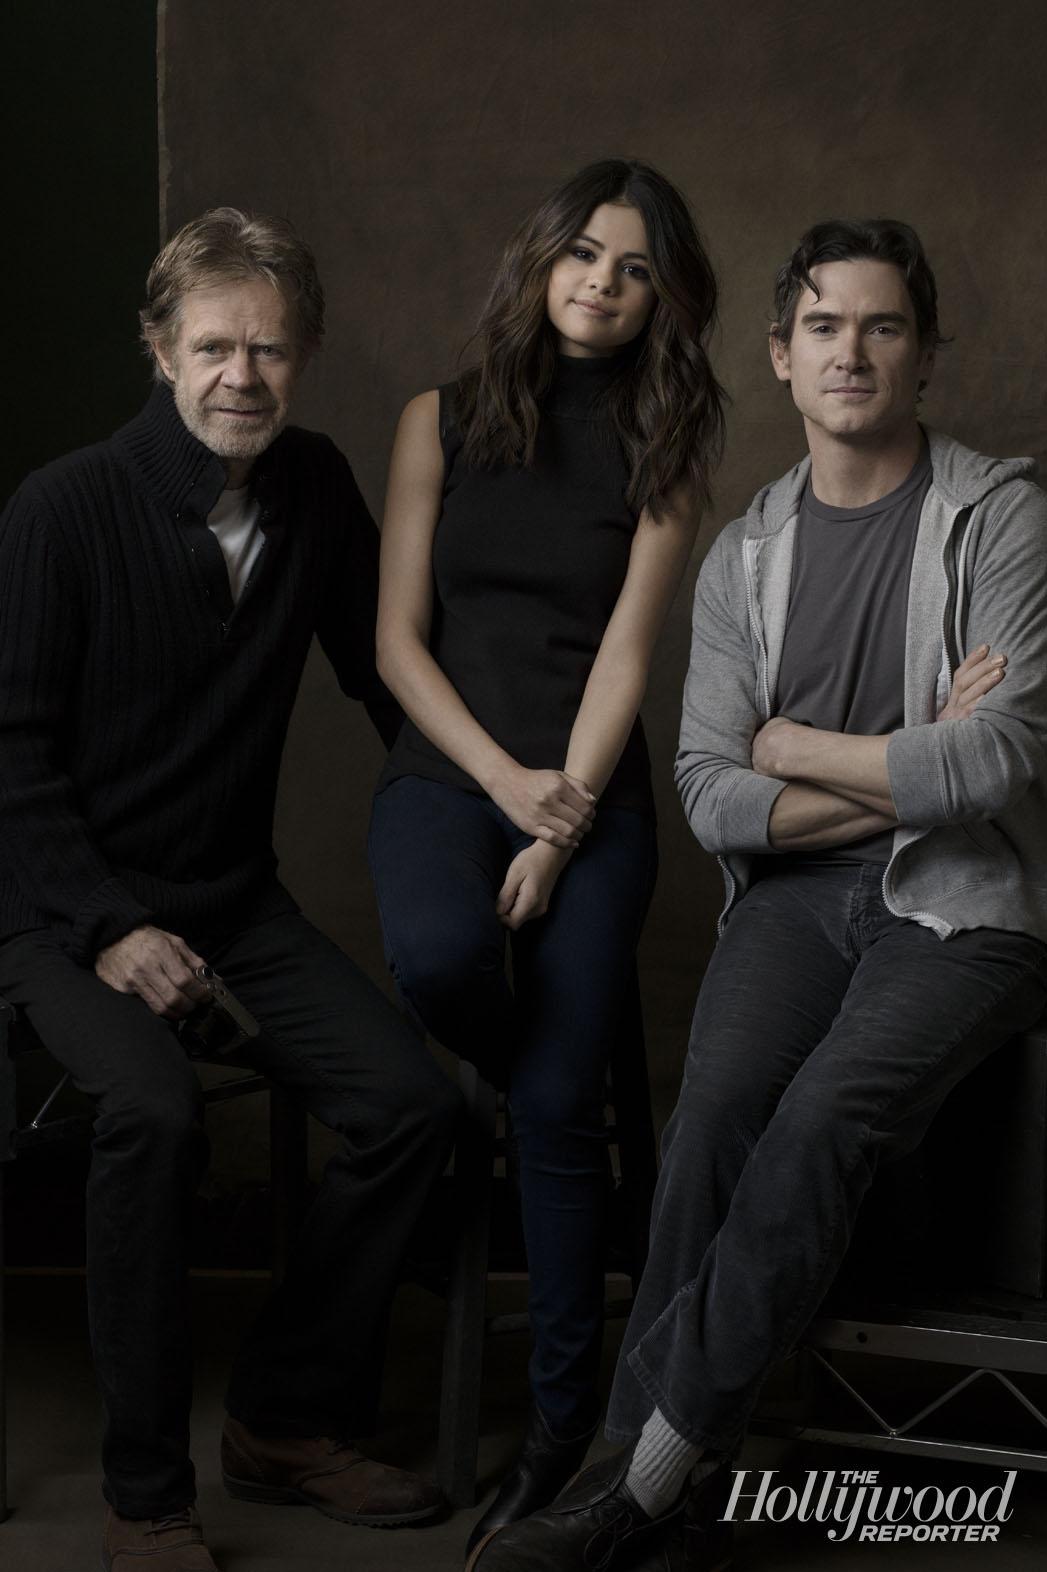 William H. Macy, Selena Gomez and Billy Crudup